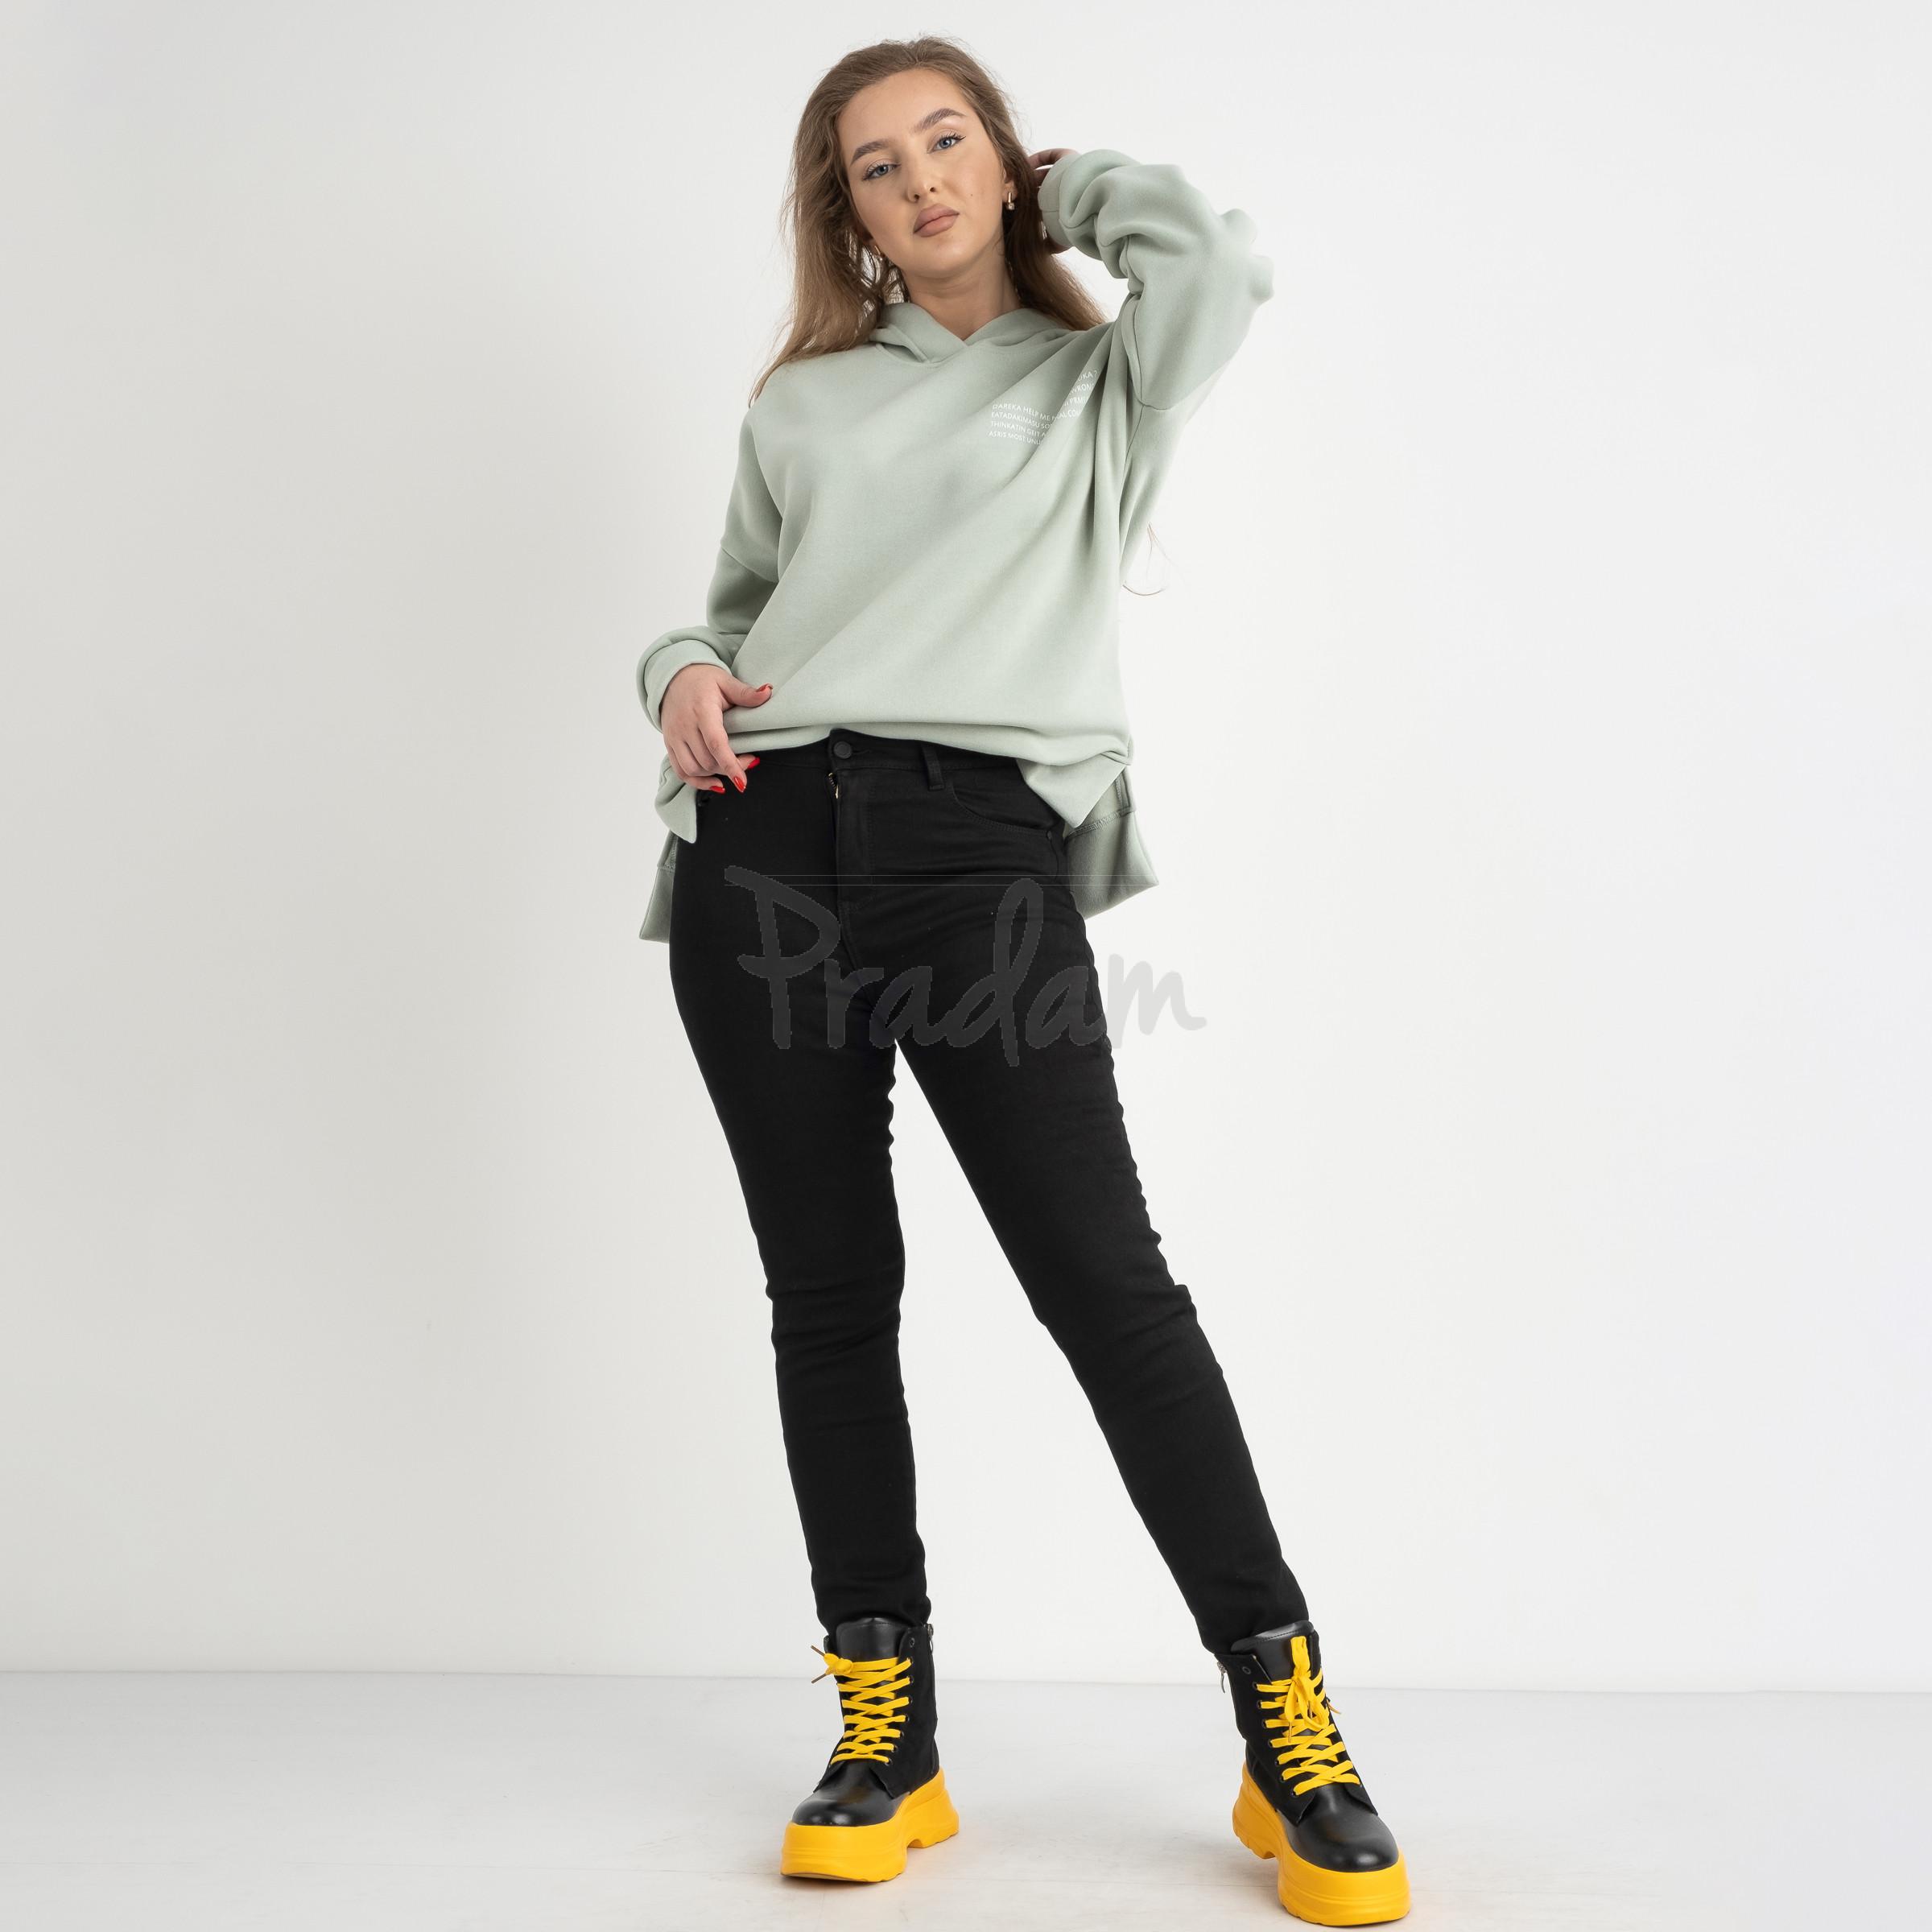 6032 New Jeans американка черная полубатальная стрейчевая на байке (6 ед.размеры: 28.29.30.31.32.33)